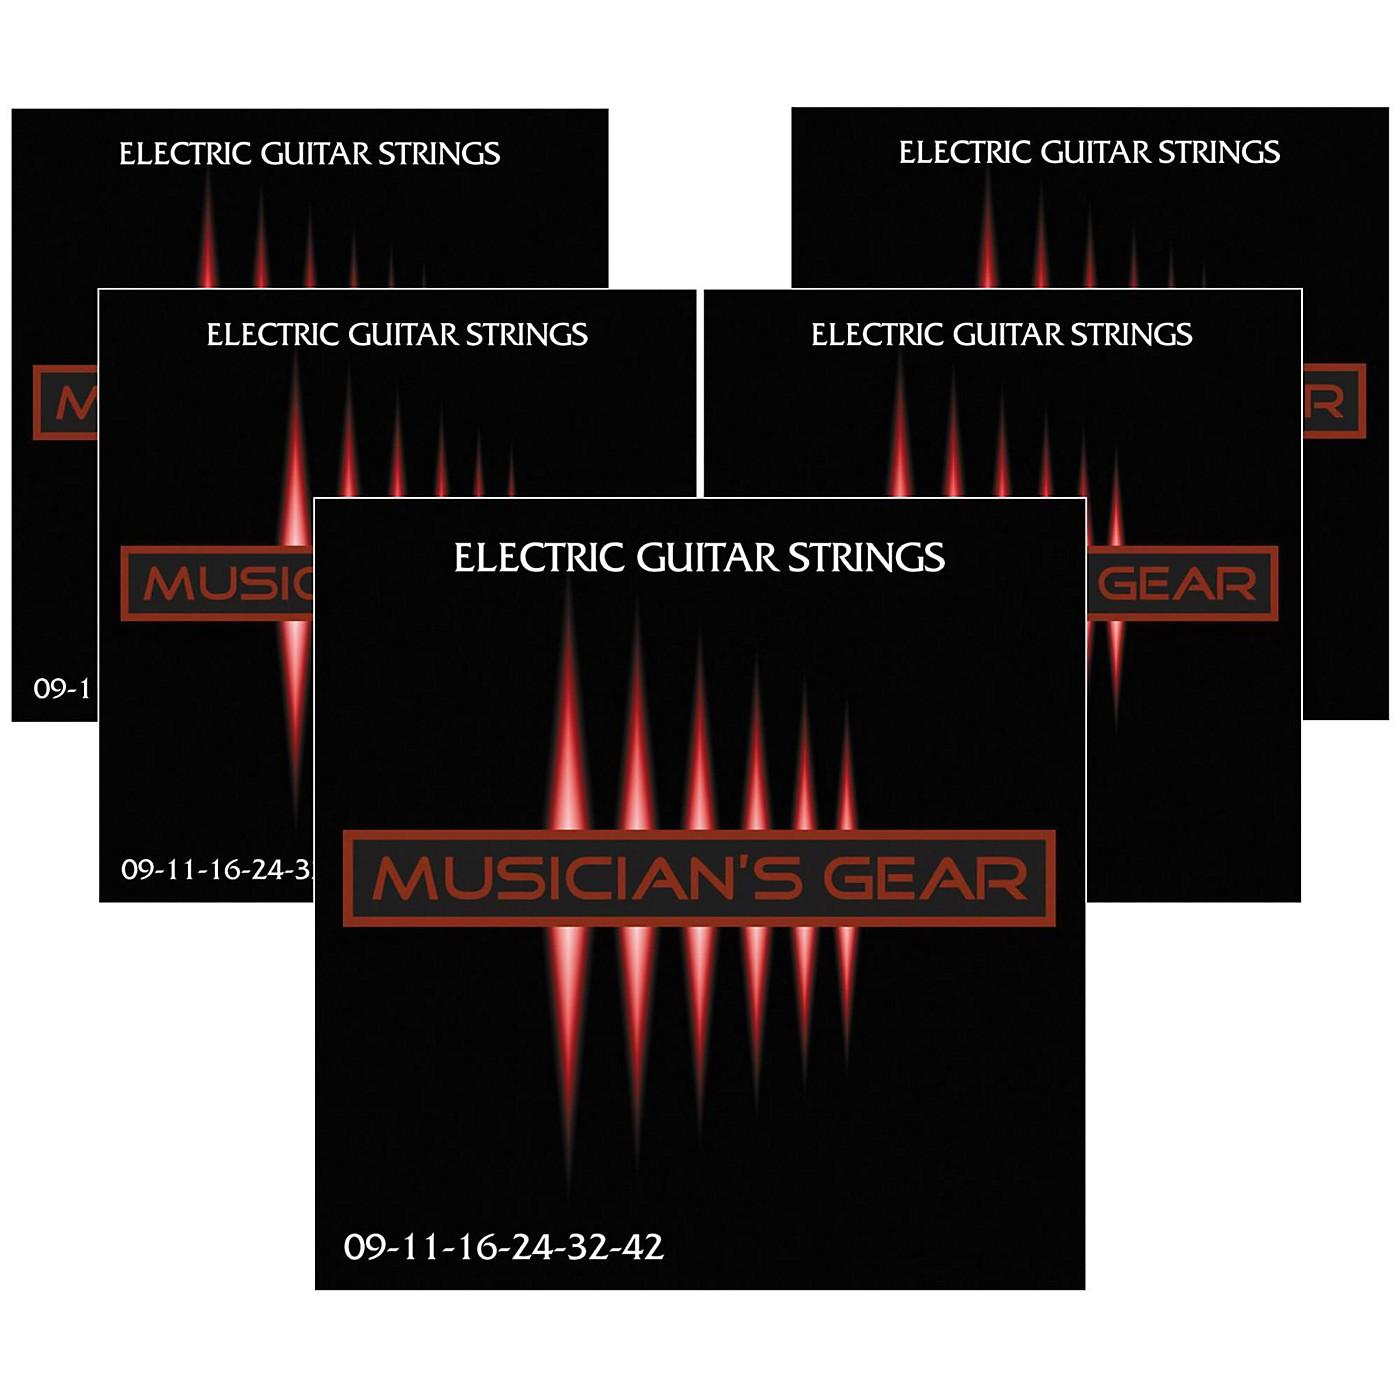 Musician's Gear Electric Nickel Plated Steel Guitar Strings 9-42 - 5-Pack thumbnail